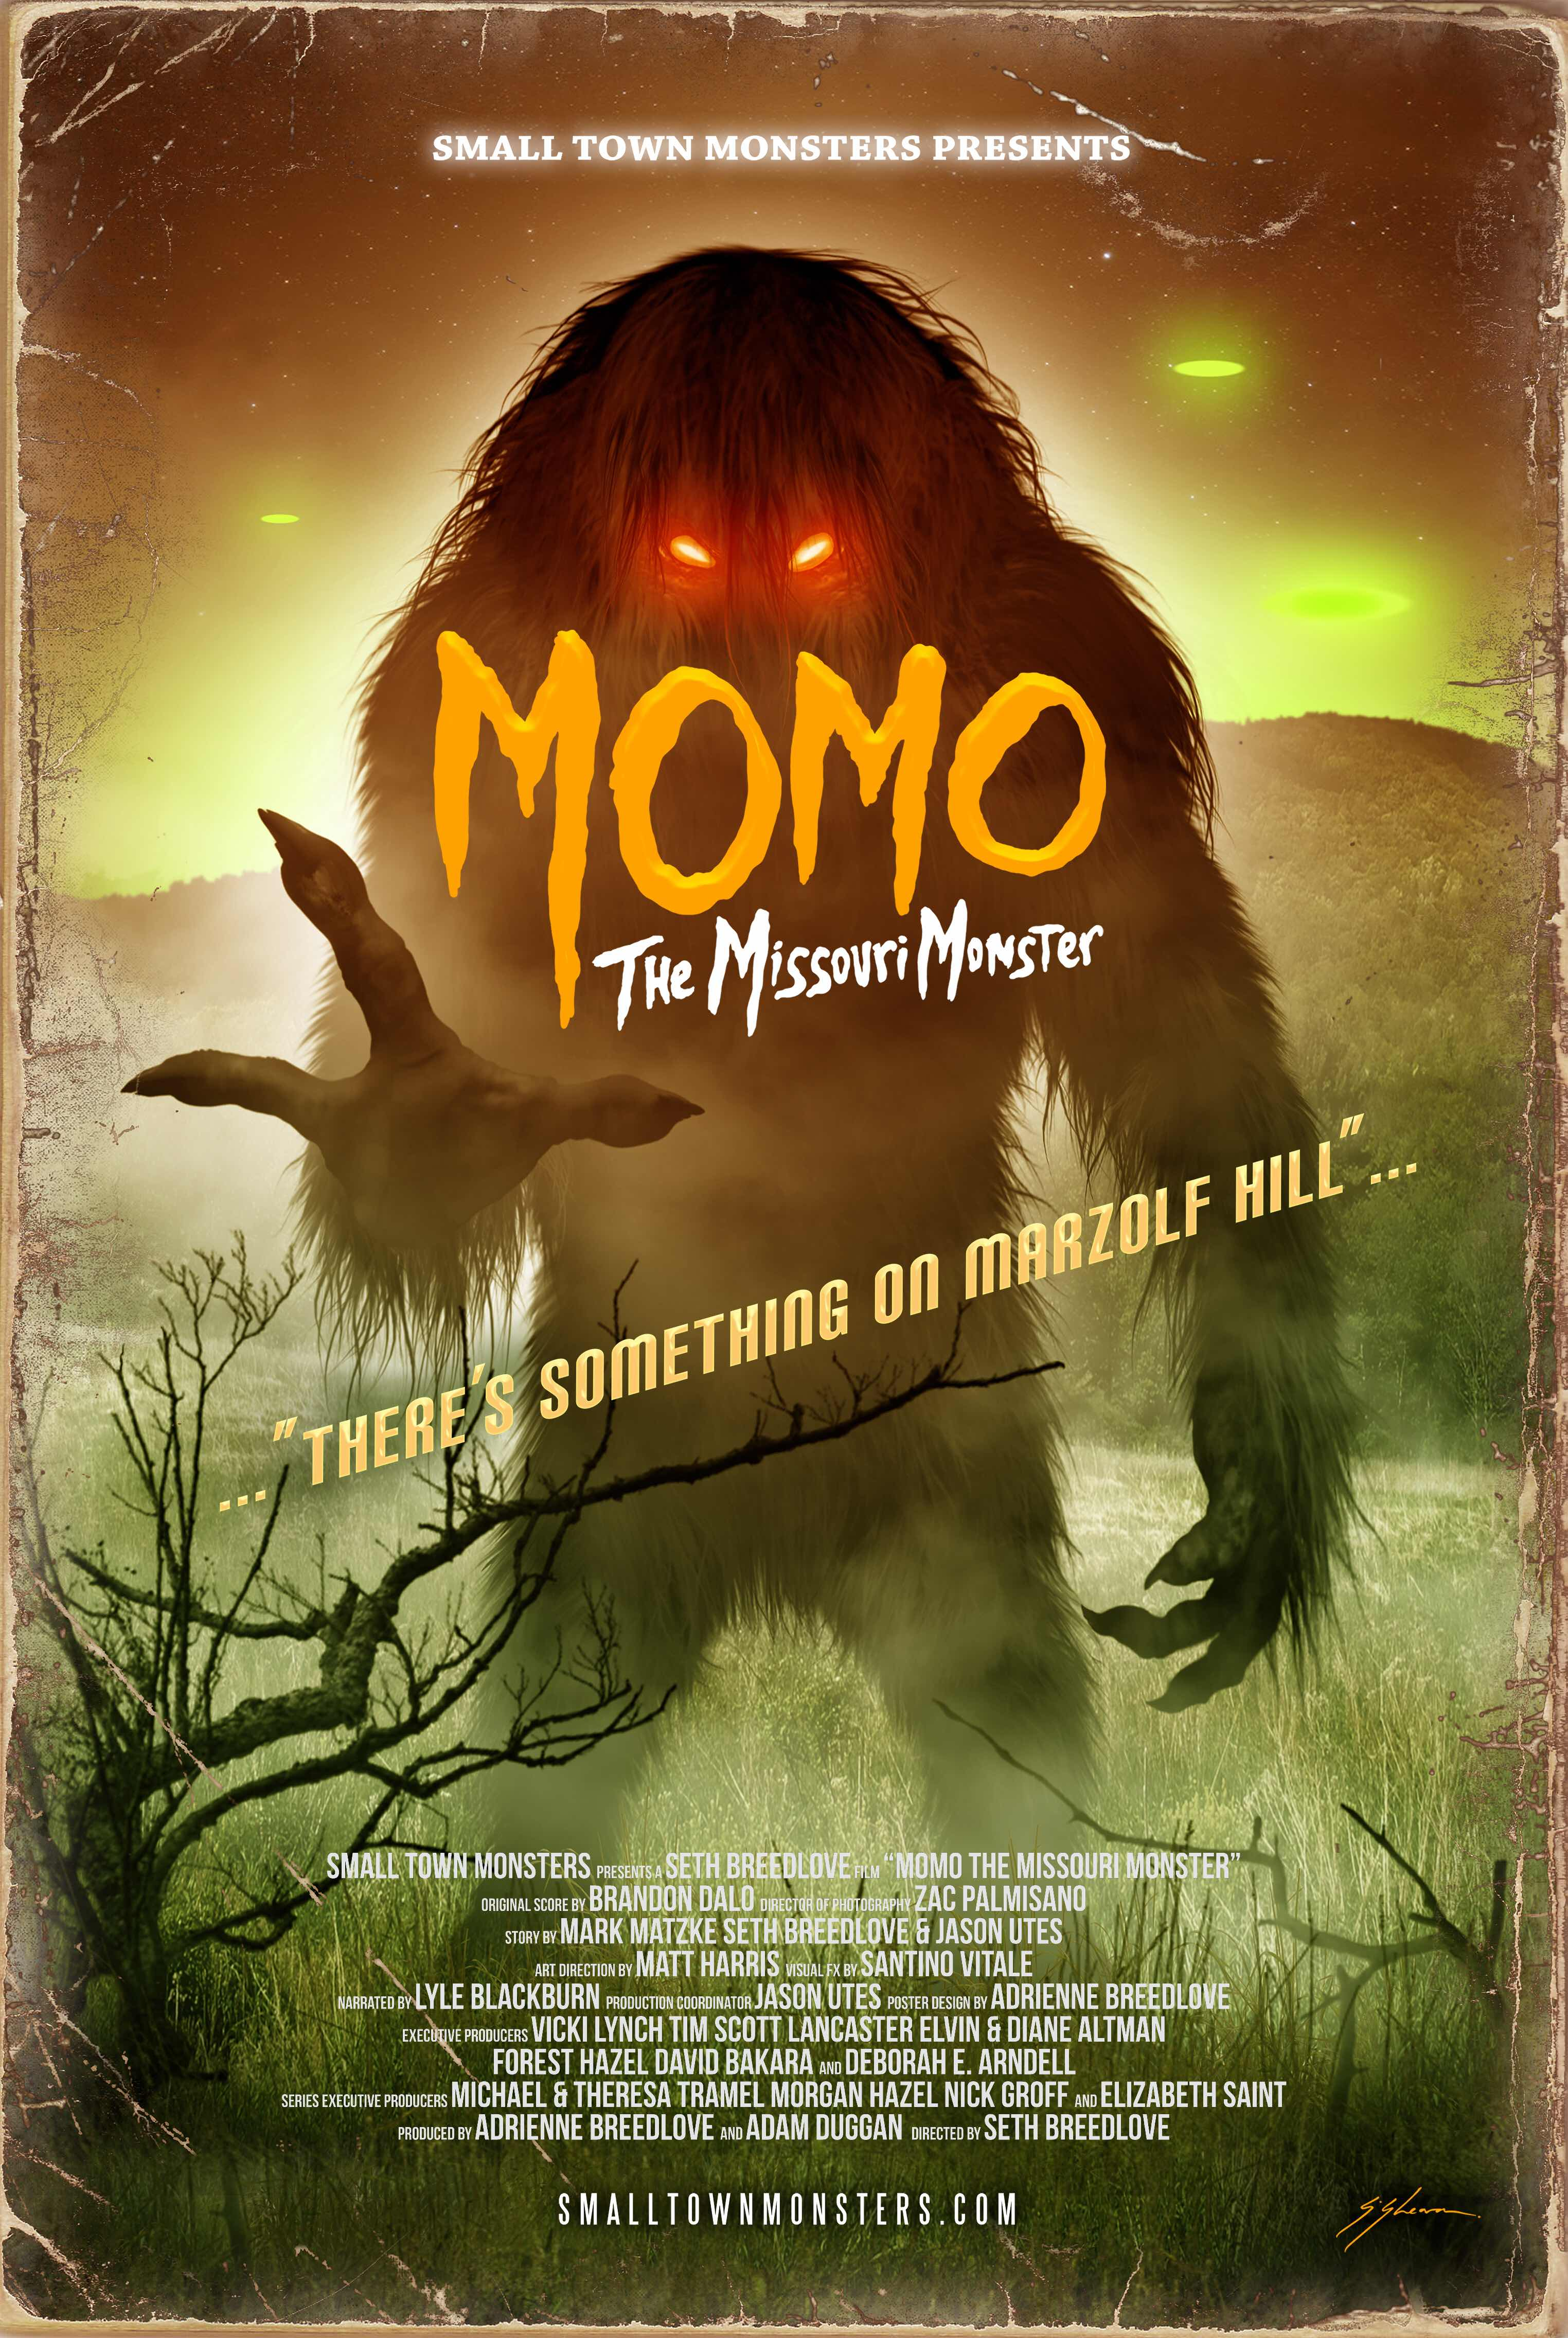 Momo Missouri Monster, Momo